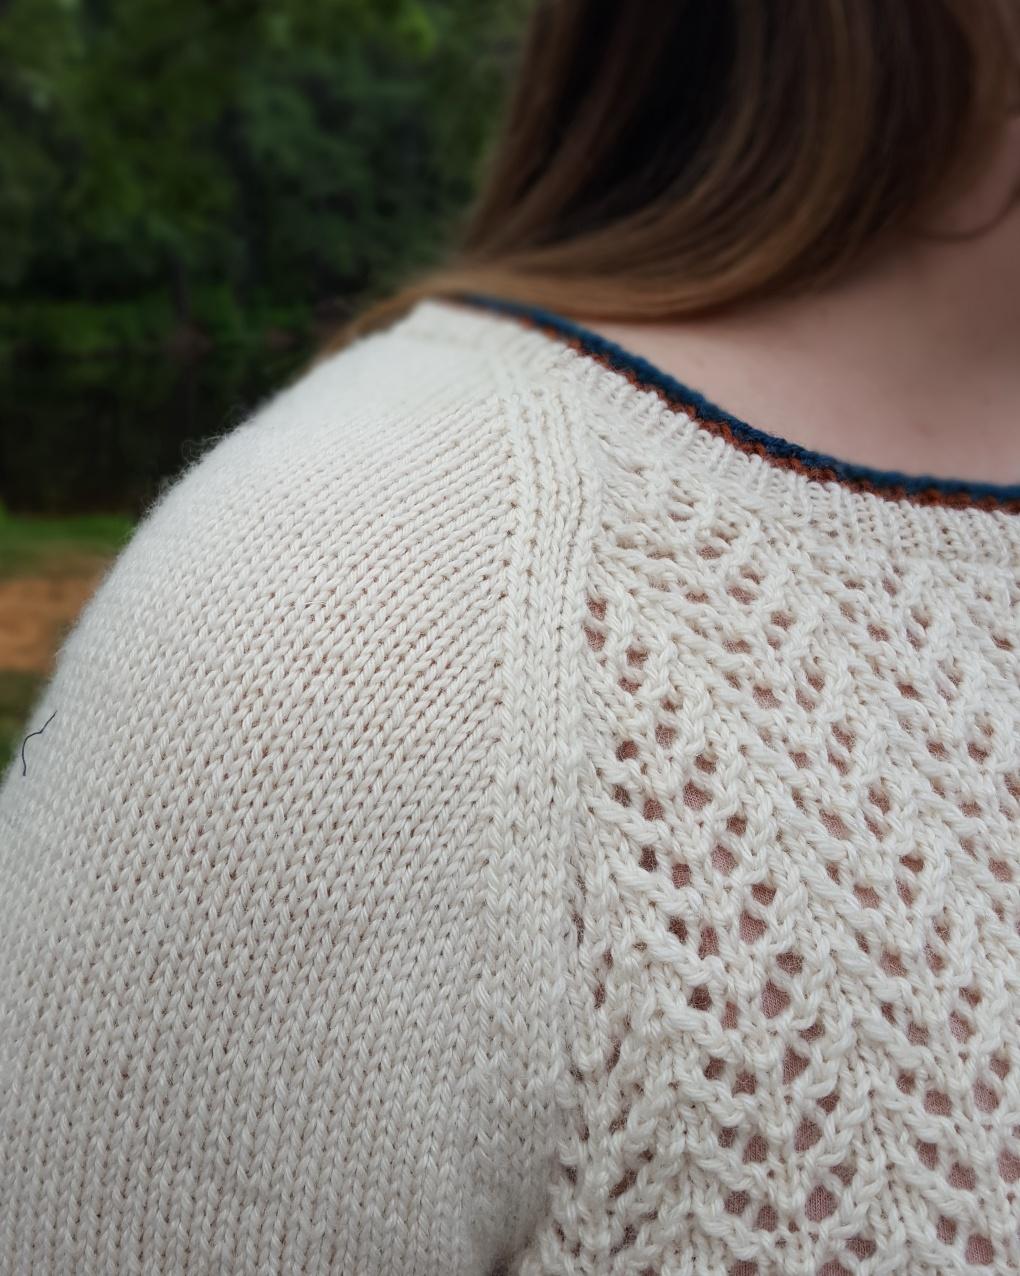 Close up of the raglan shoulder seam on the Sagebrush tee.